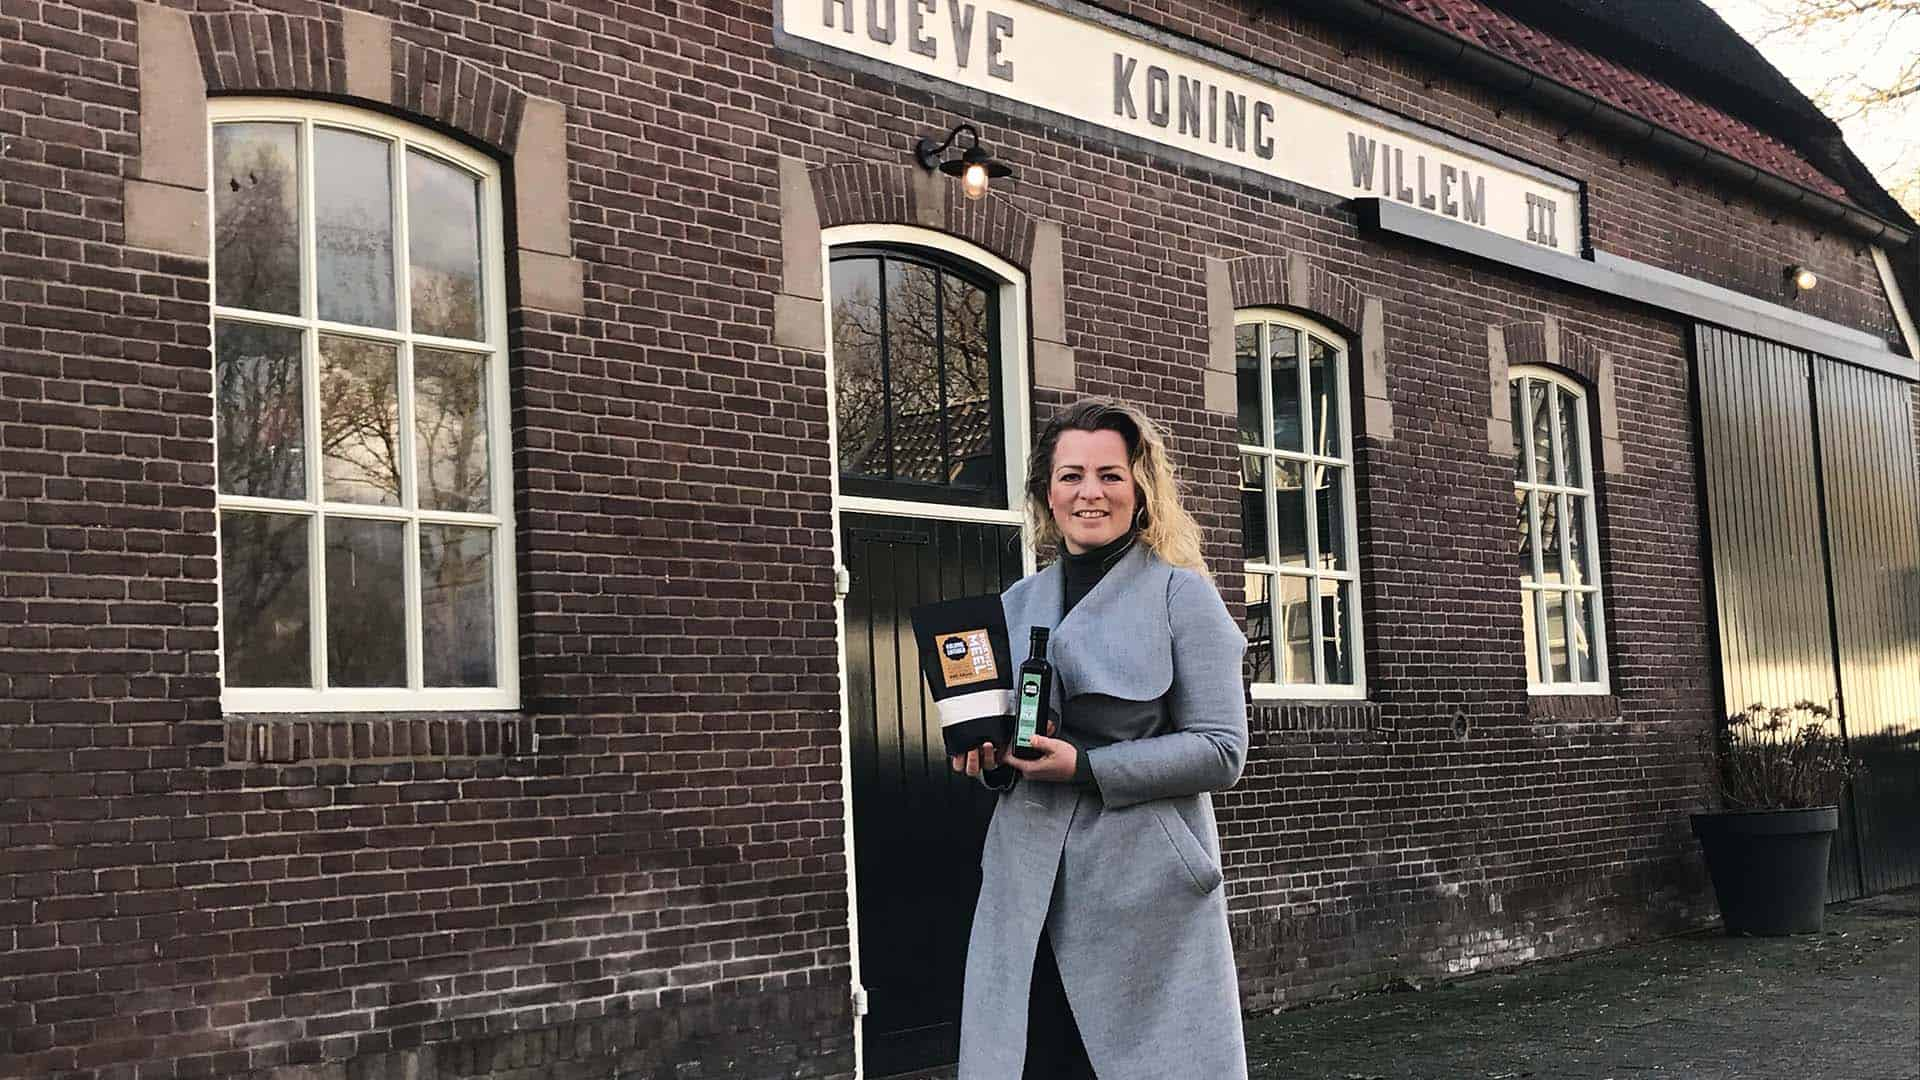 Kolonie Erfgoed Ruth Middelwijk def